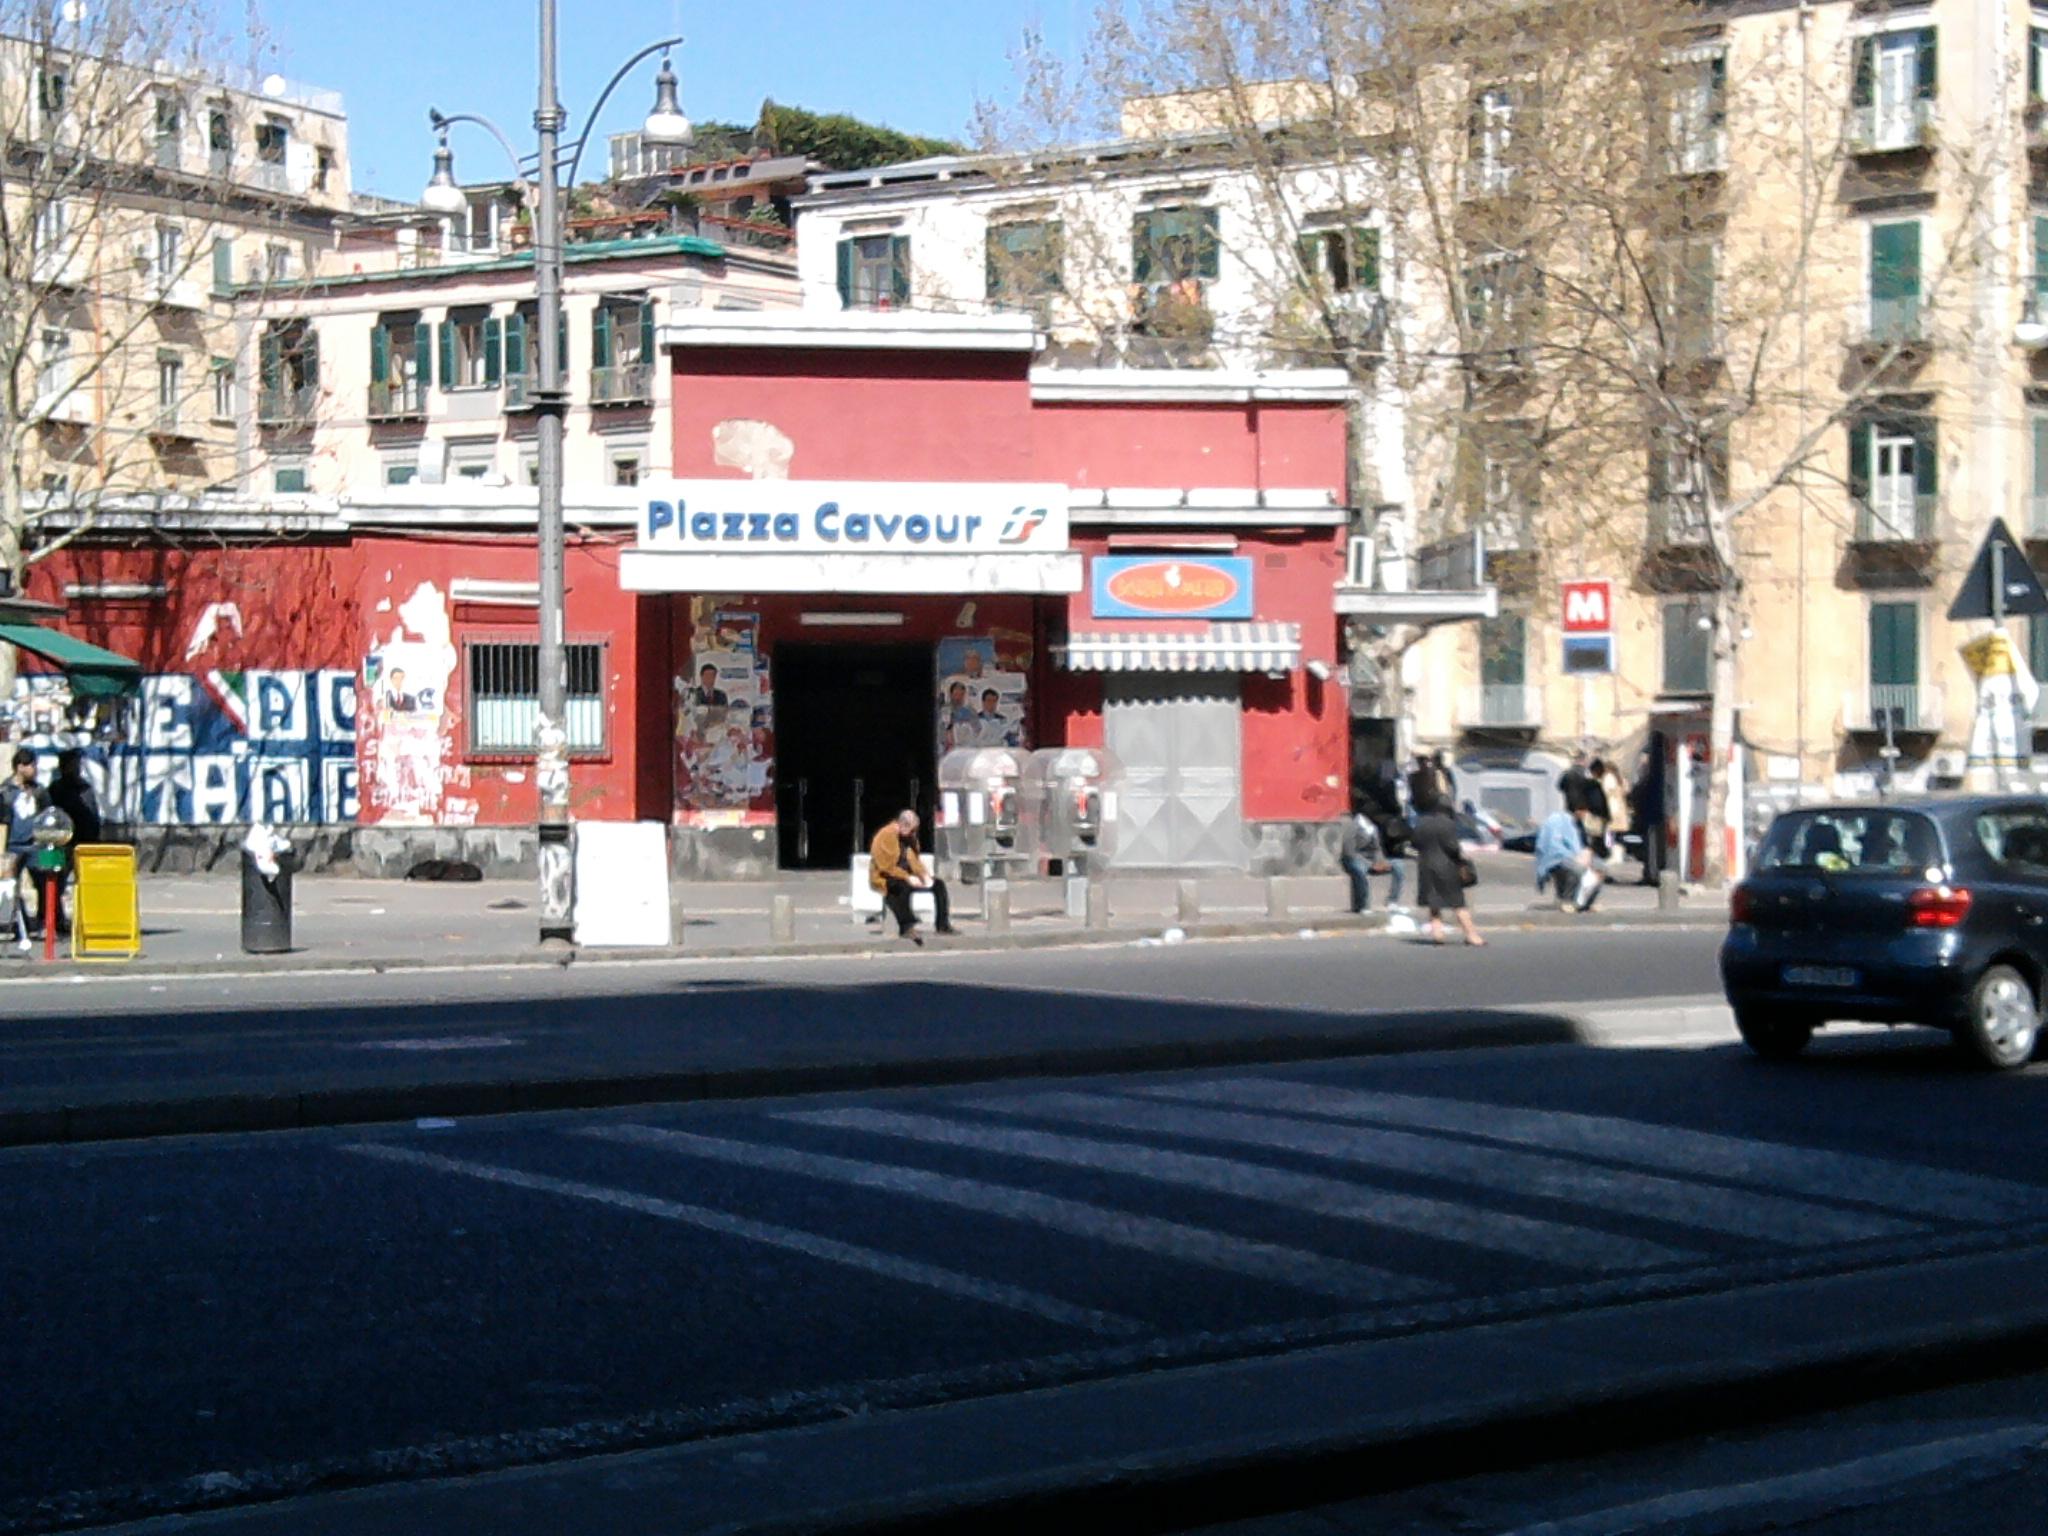 Piazza Cavour nel panico: in fiamme un furgone di rifiuti ospedalieri